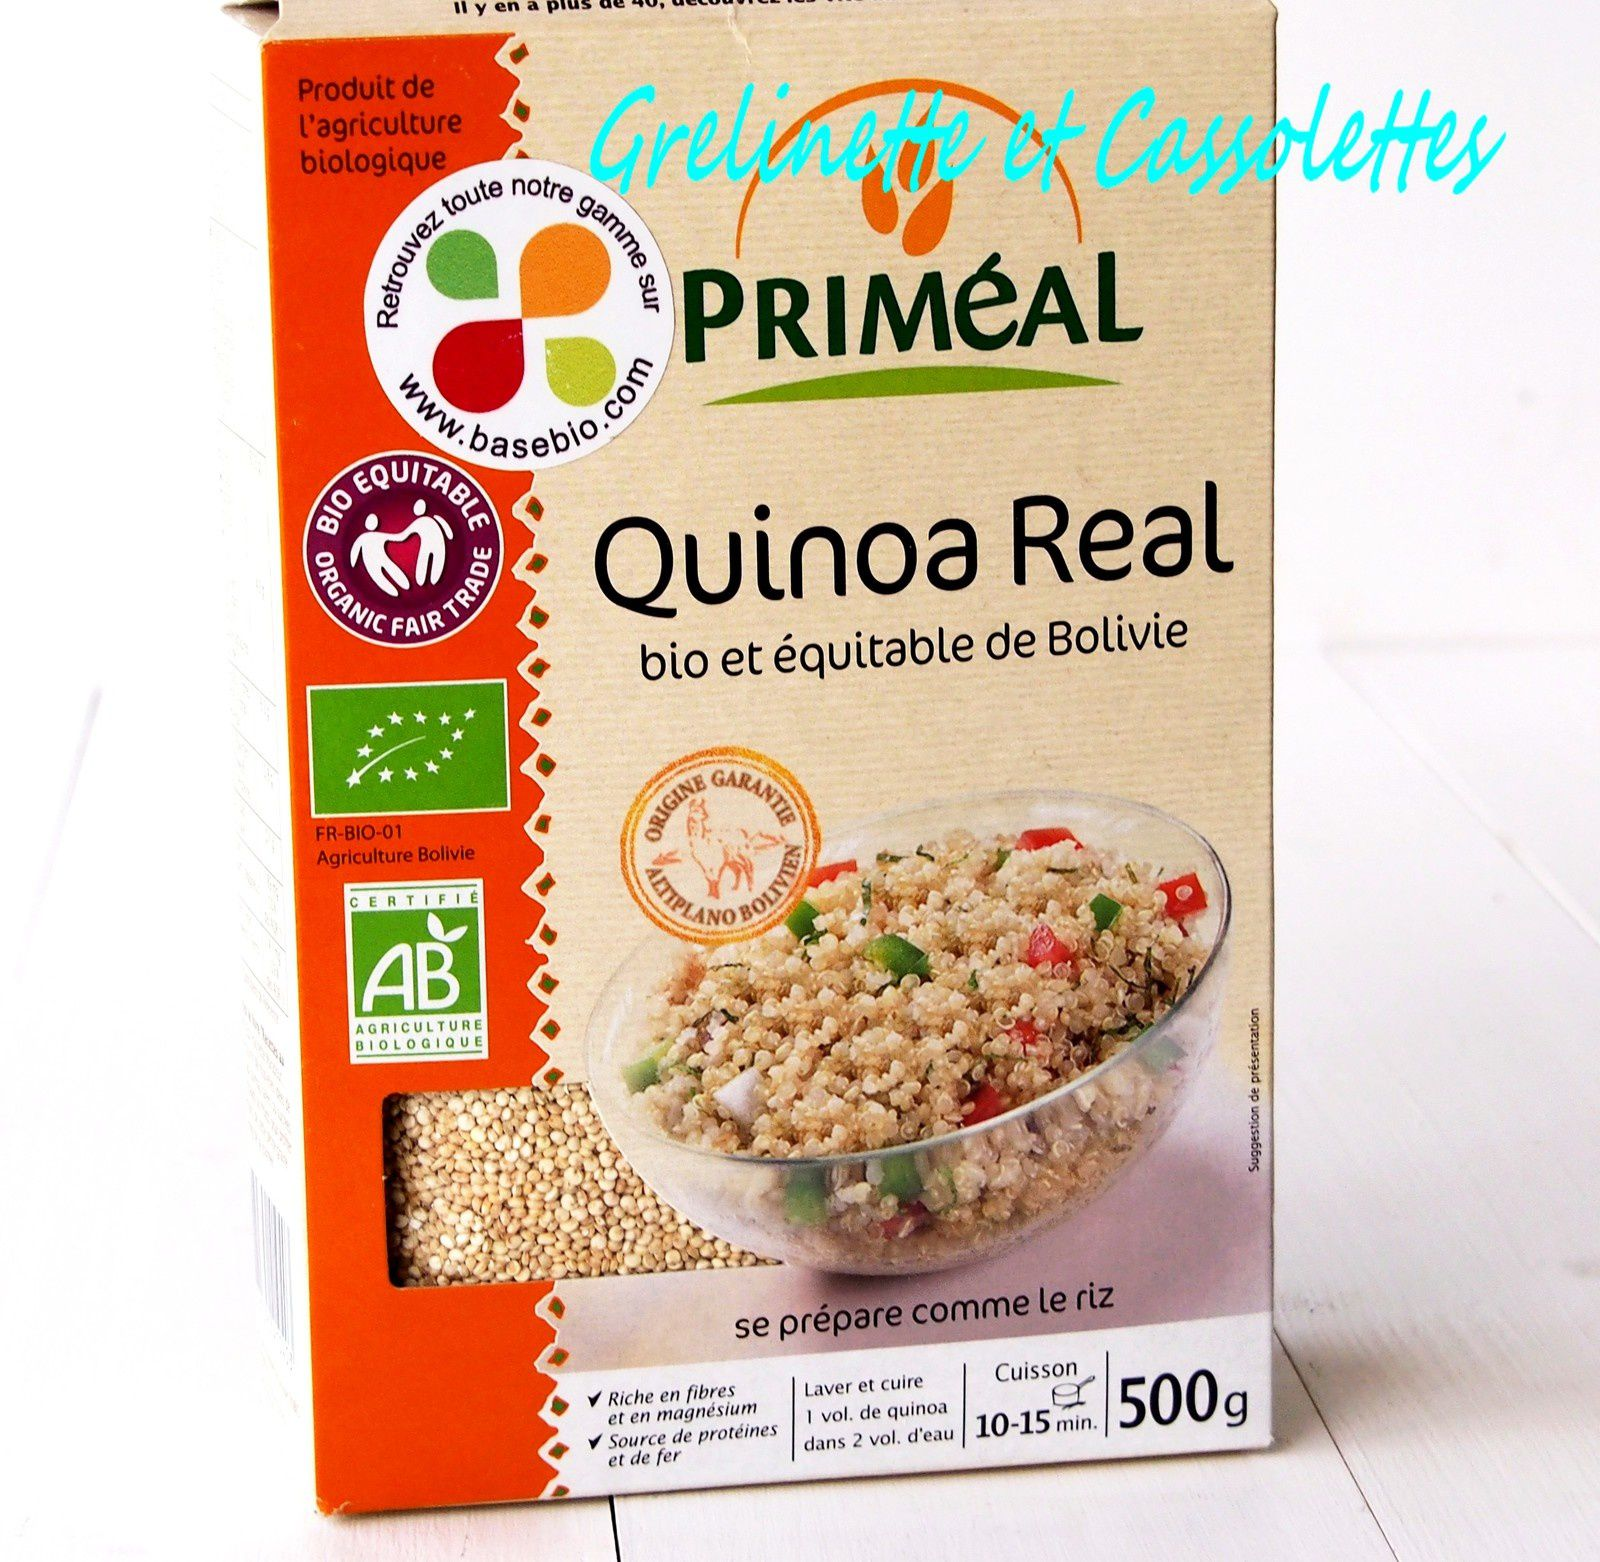 Aubergines Farcies au Quinoa, Fromage de Brebis, Estragon et Olives Noires